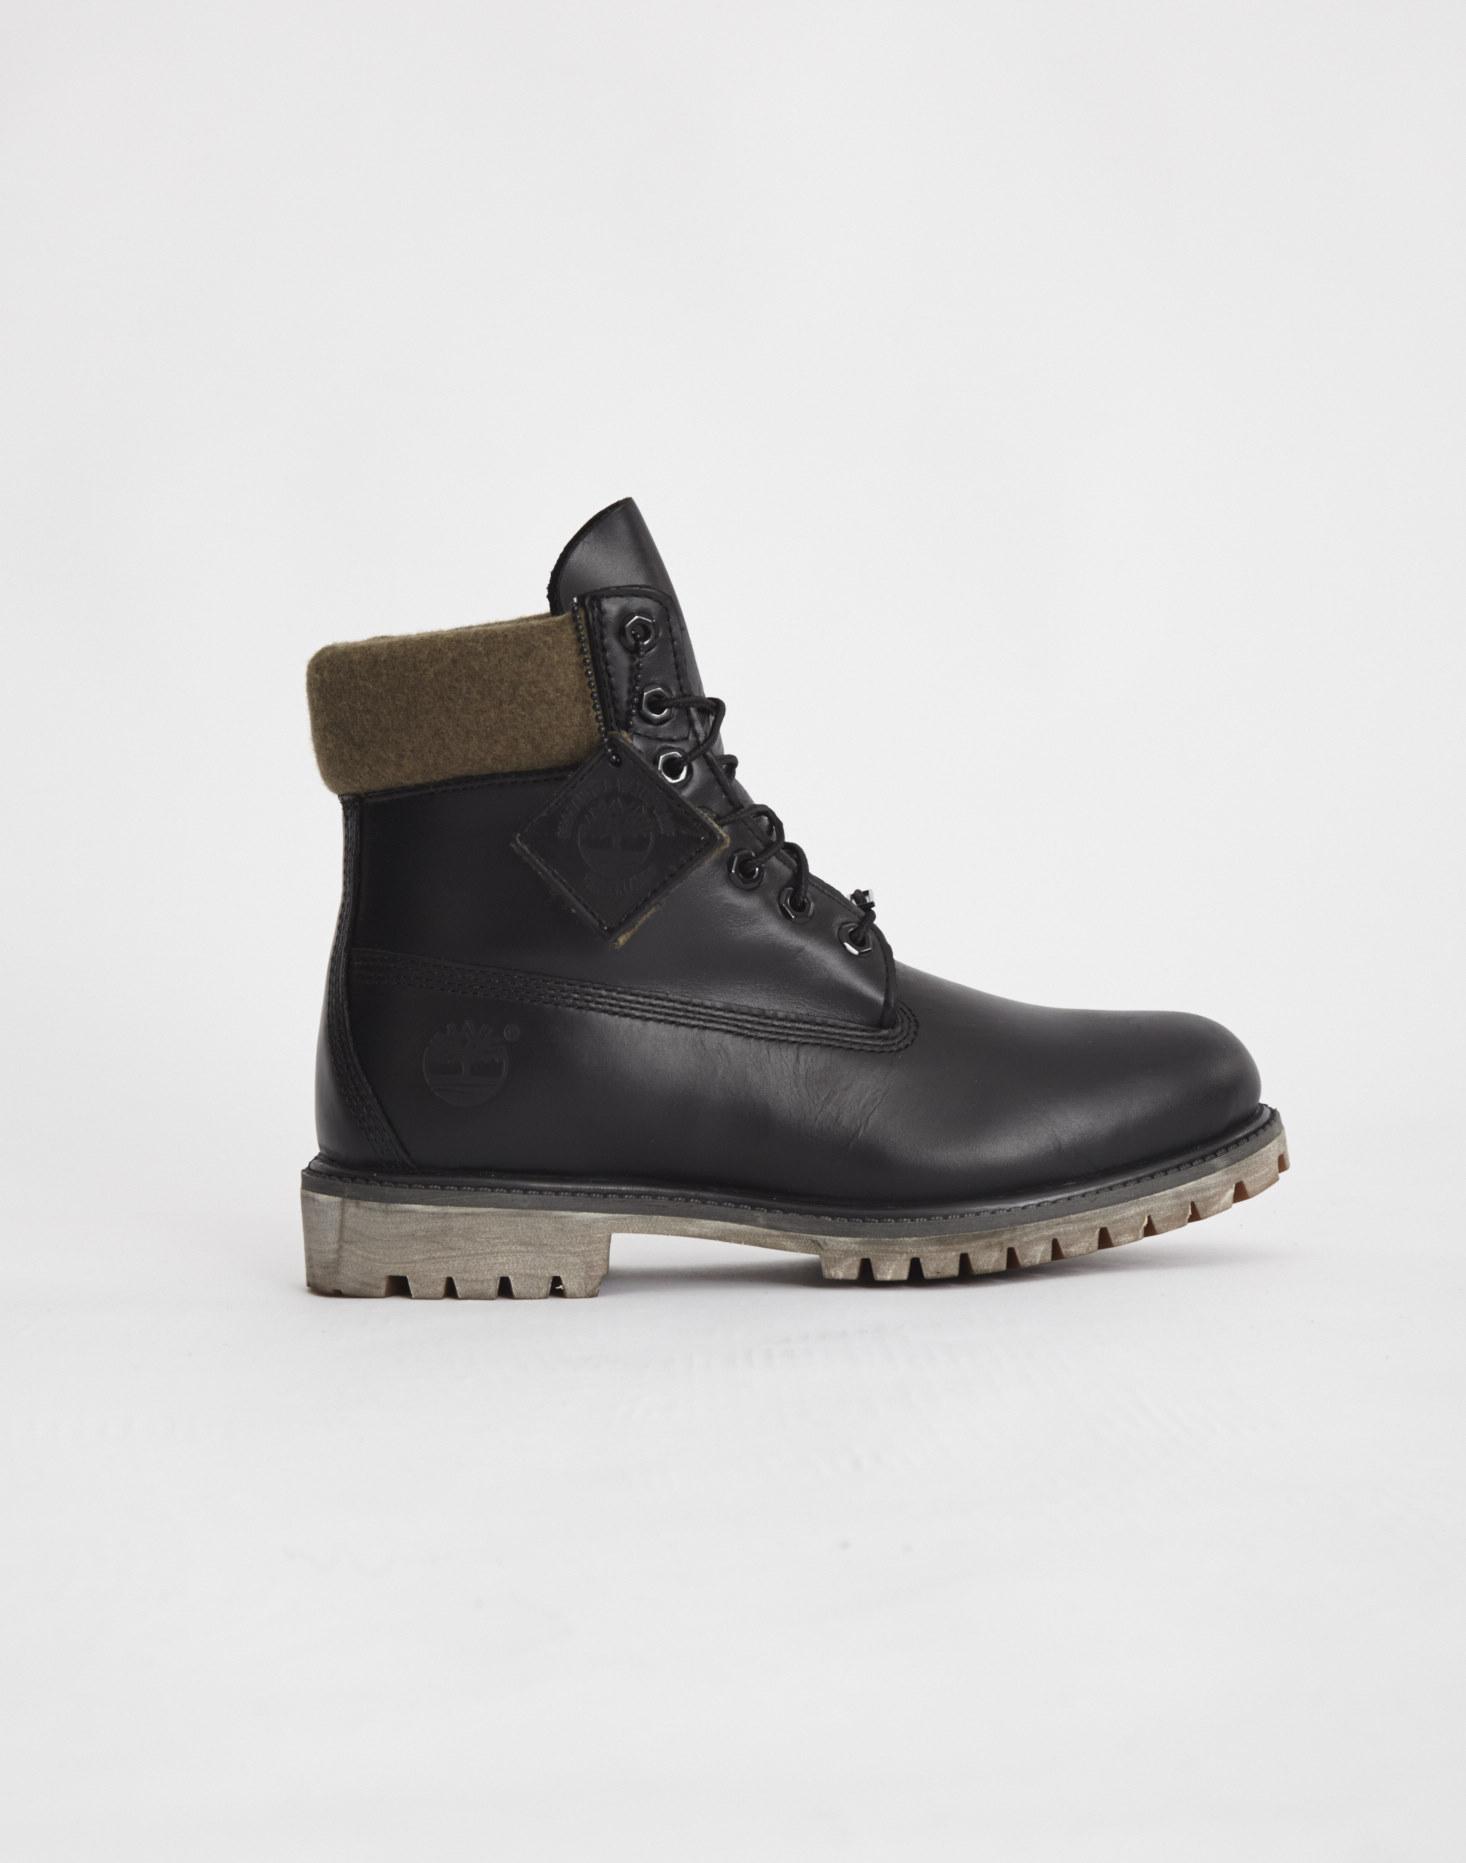 timberland icon 6 quot premium boot black thebeardmag